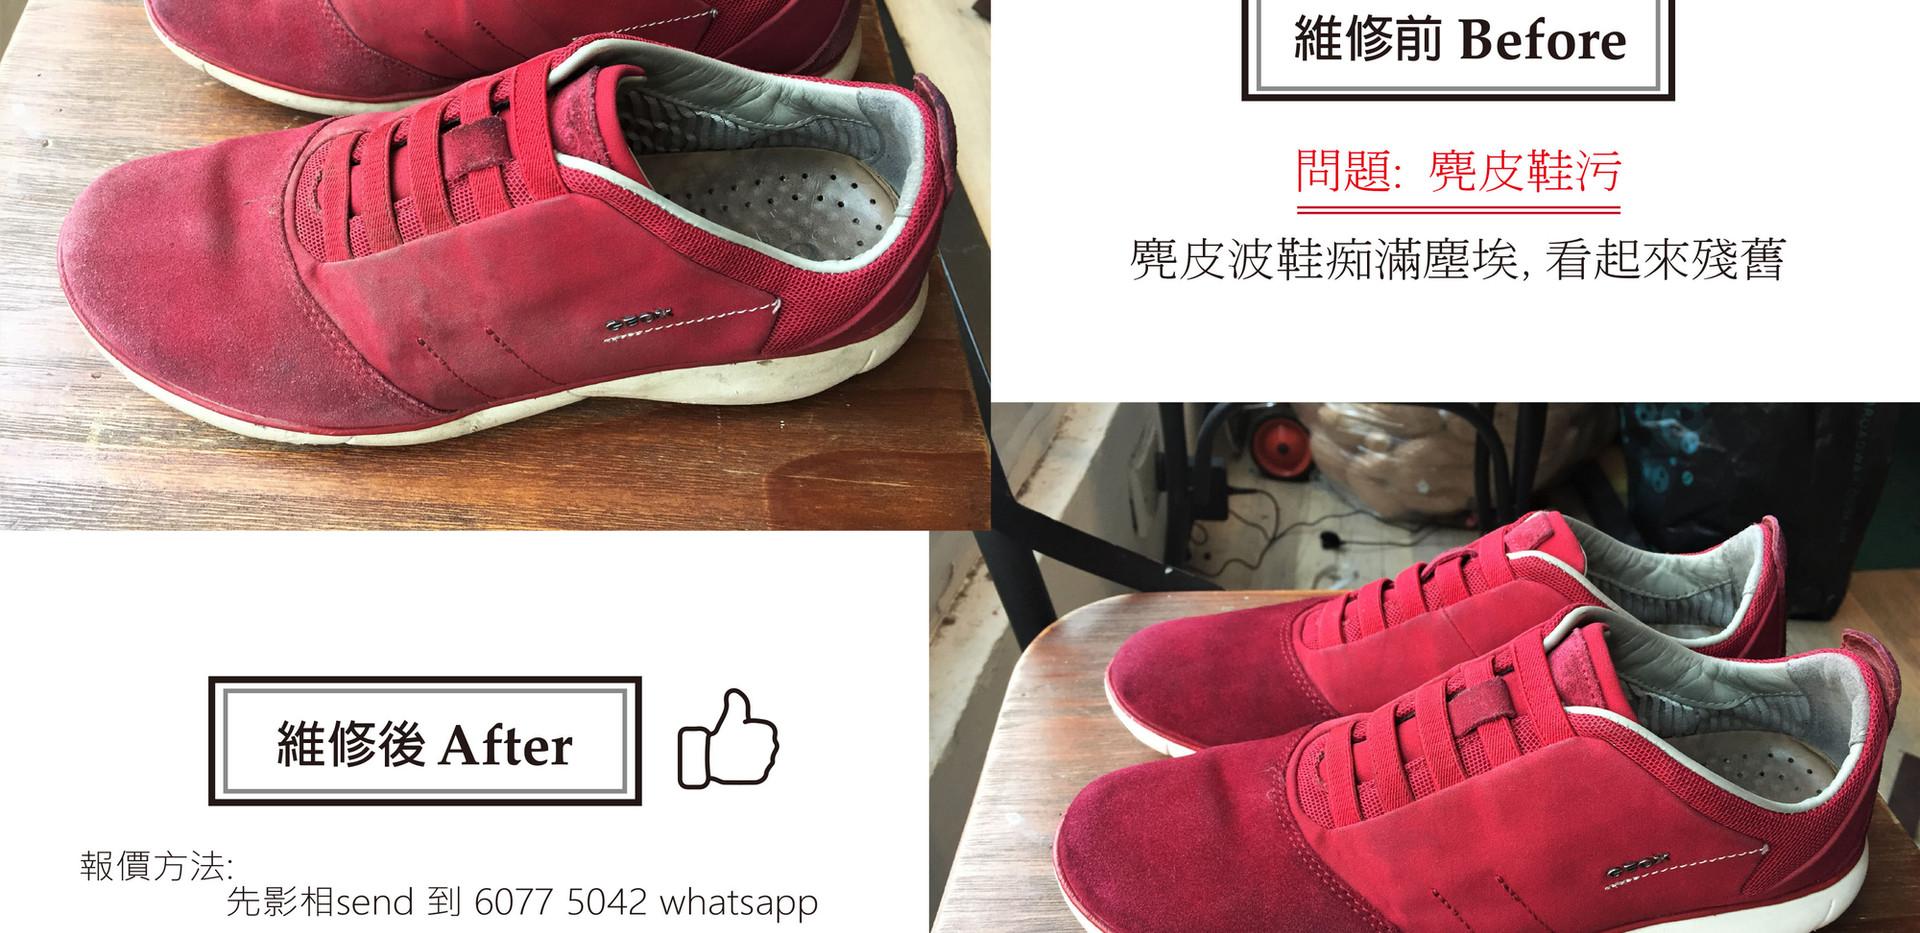 geox shoes.jpg